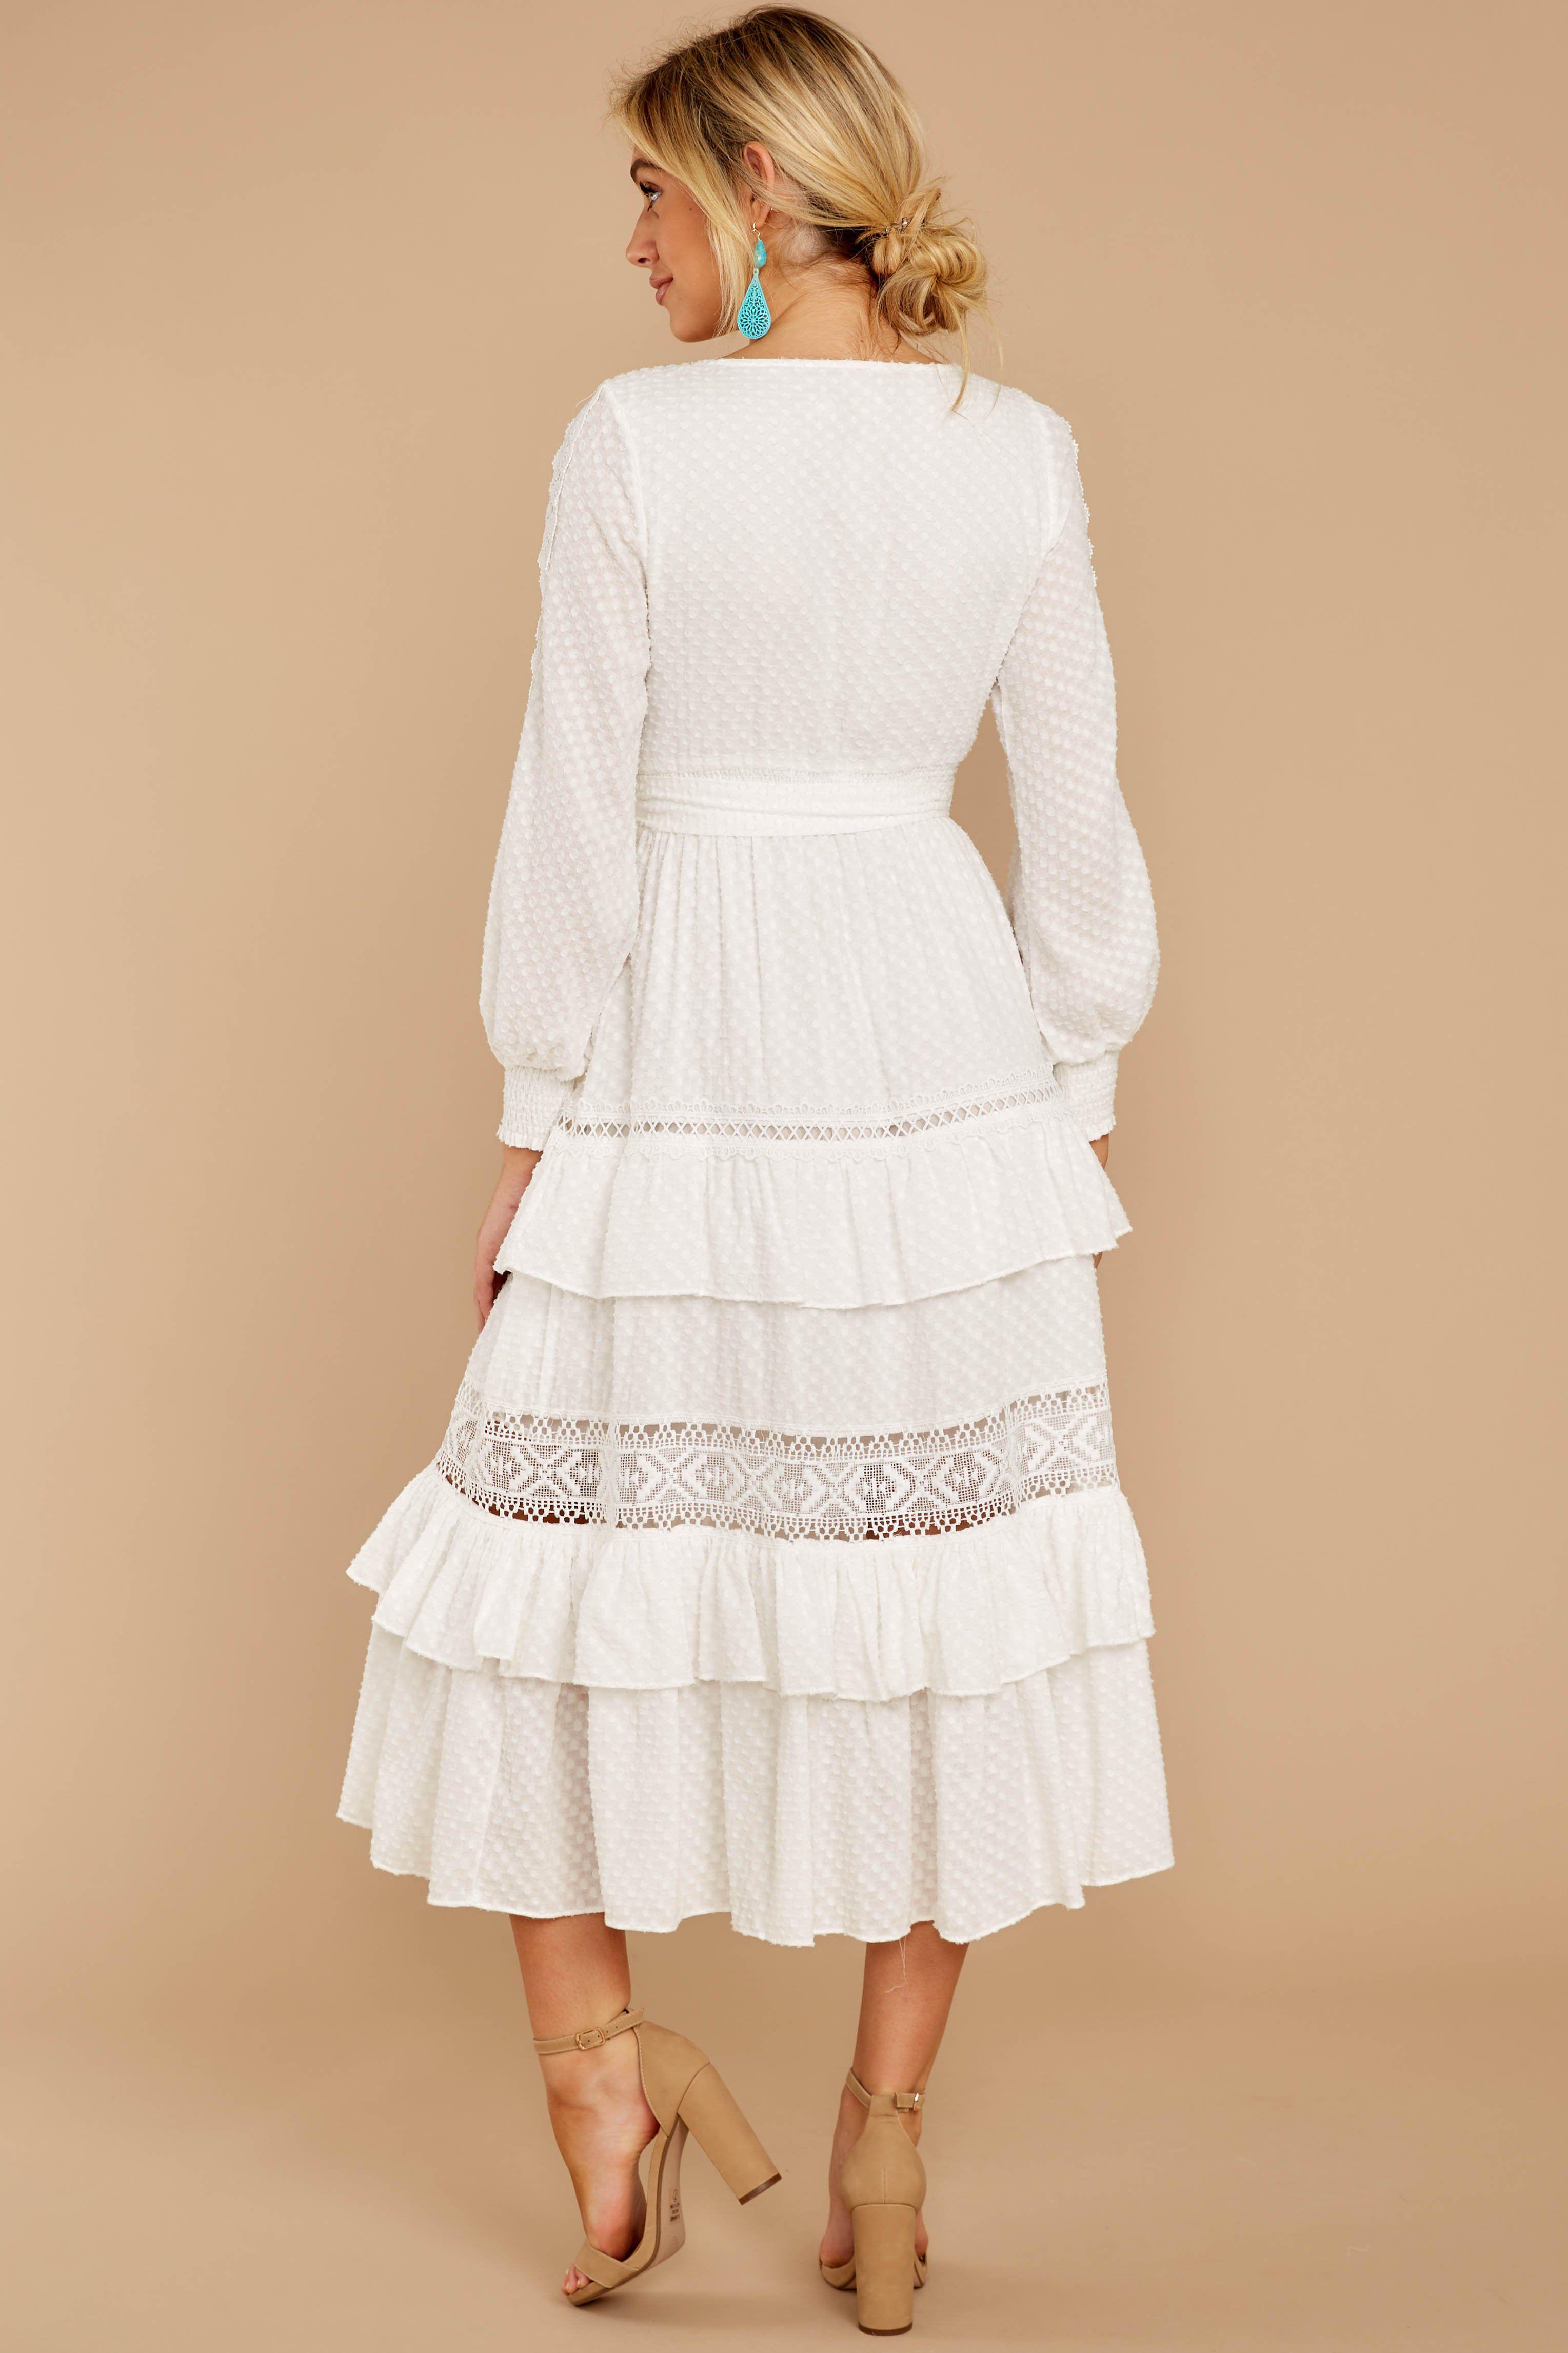 One Day Soon White Lace Midi Dress White Lace Midi Dress Dresses Midi Dress [ 4586 x 3057 Pixel ]